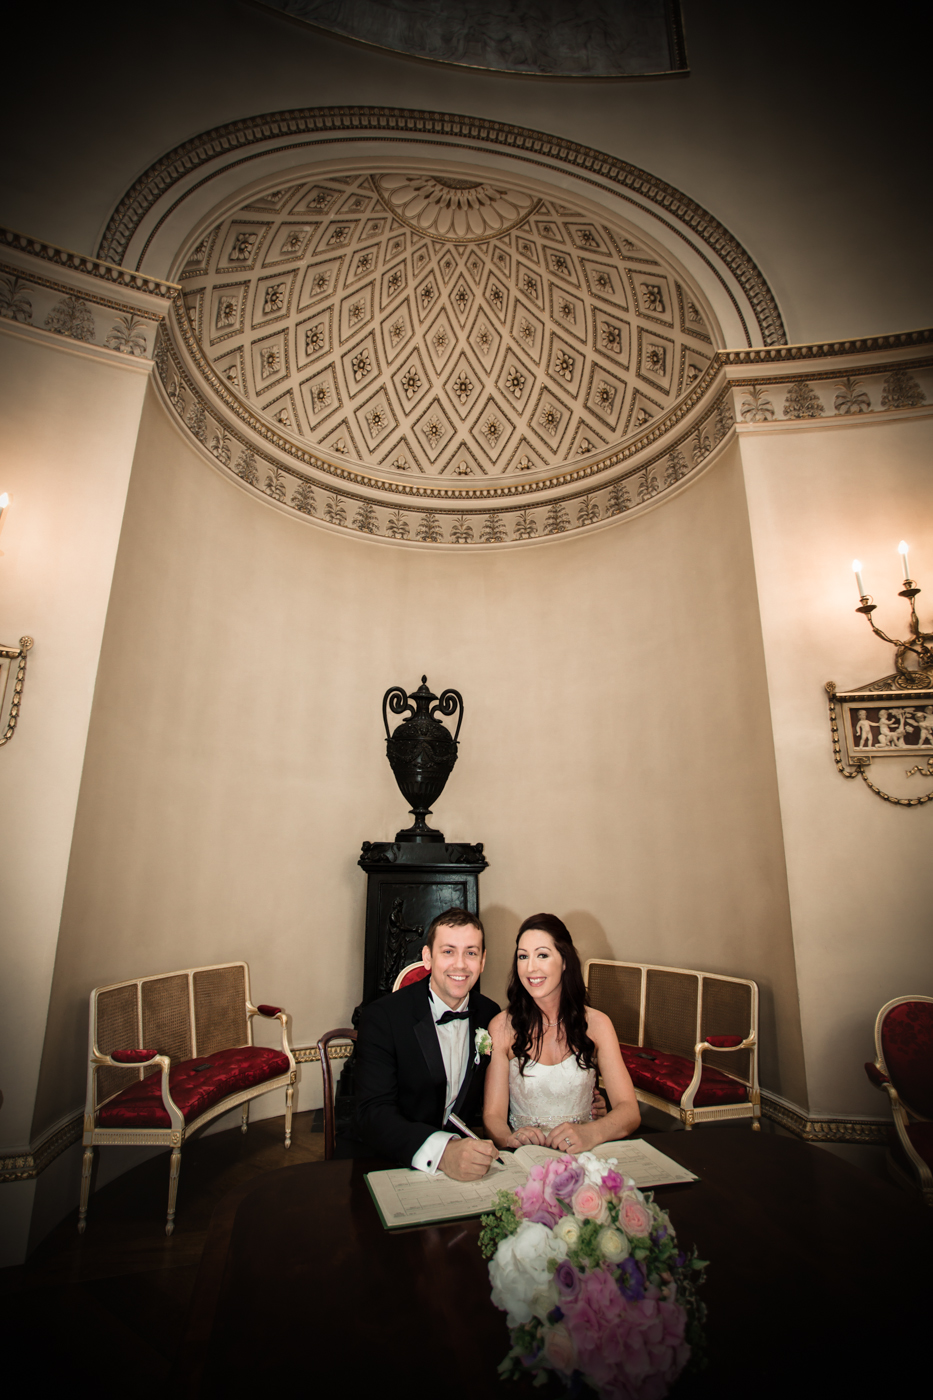 071 - Abi and Chris at Kedleston Hall - Wedding Photography by Mark Pugh www.markpugh.com - 0216.JPG